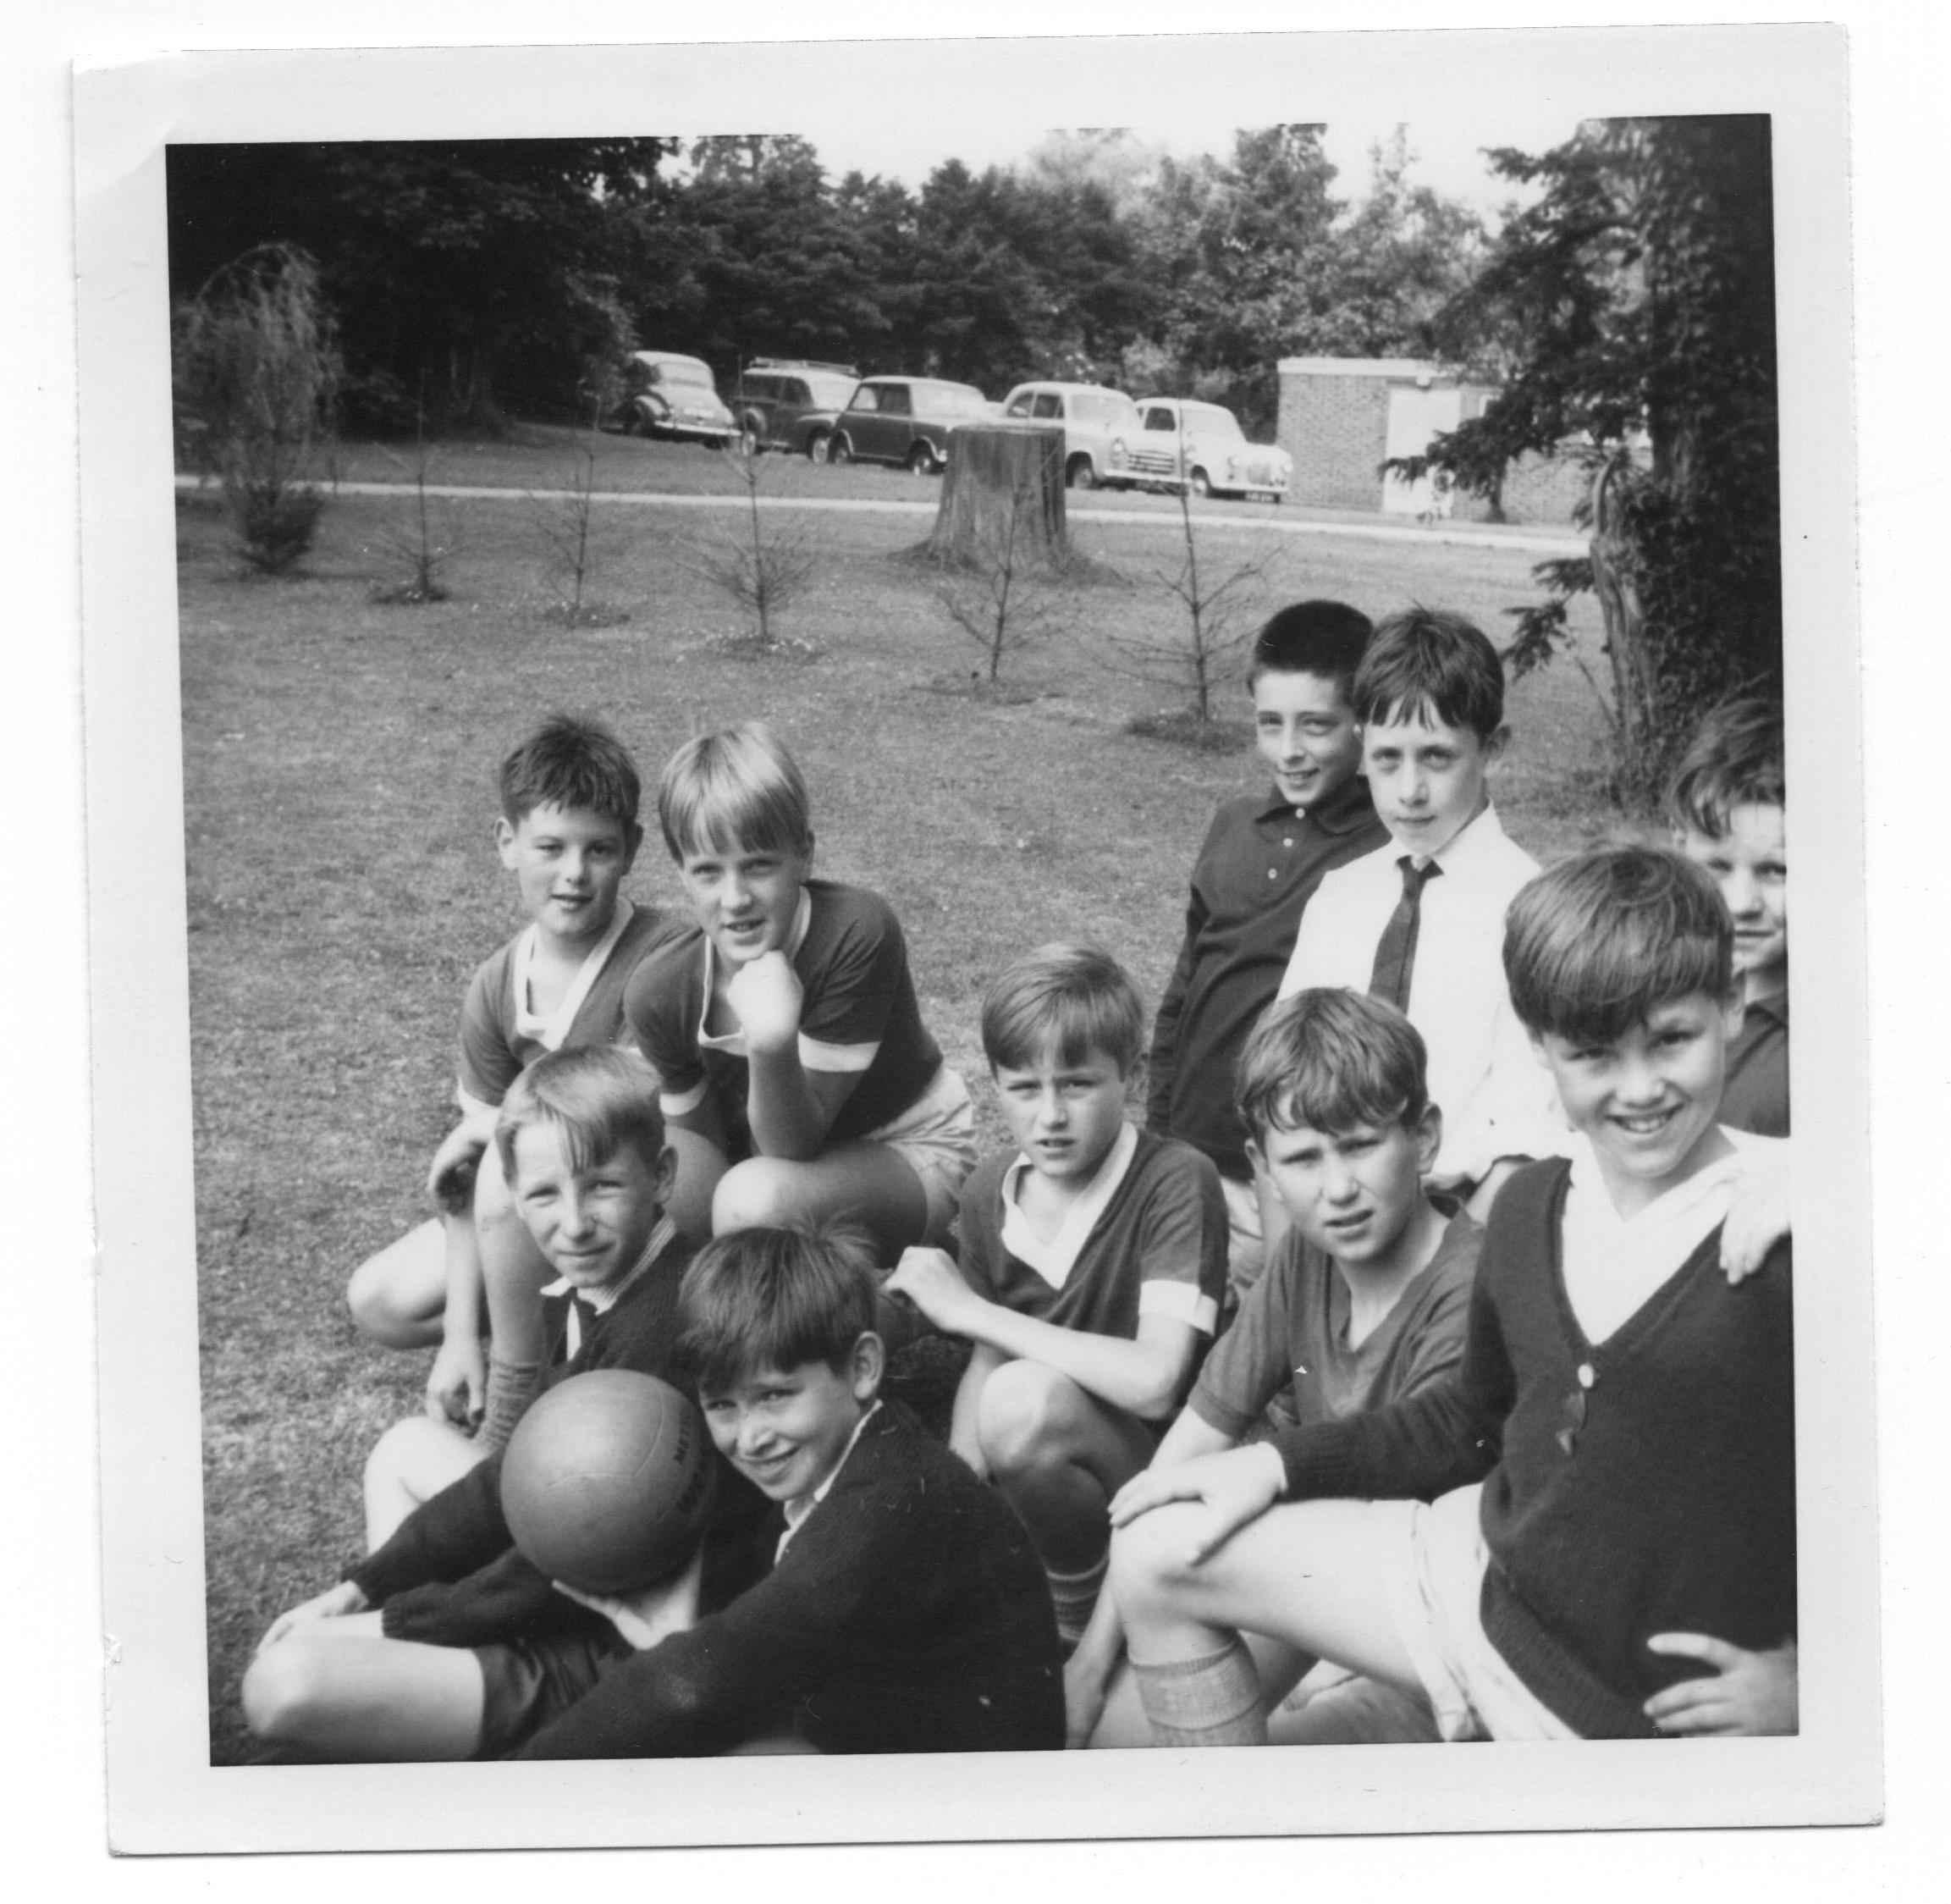 Eastwick football team 1965 - Football Team 1965 - b. -Christopher Glaum, Robert Muirhead, ? m. - Ian white, Martin Claytor, Gregory Able, Paul Hiscutt, Kevan Bundell f. - Ian Cook , Alan Baker.